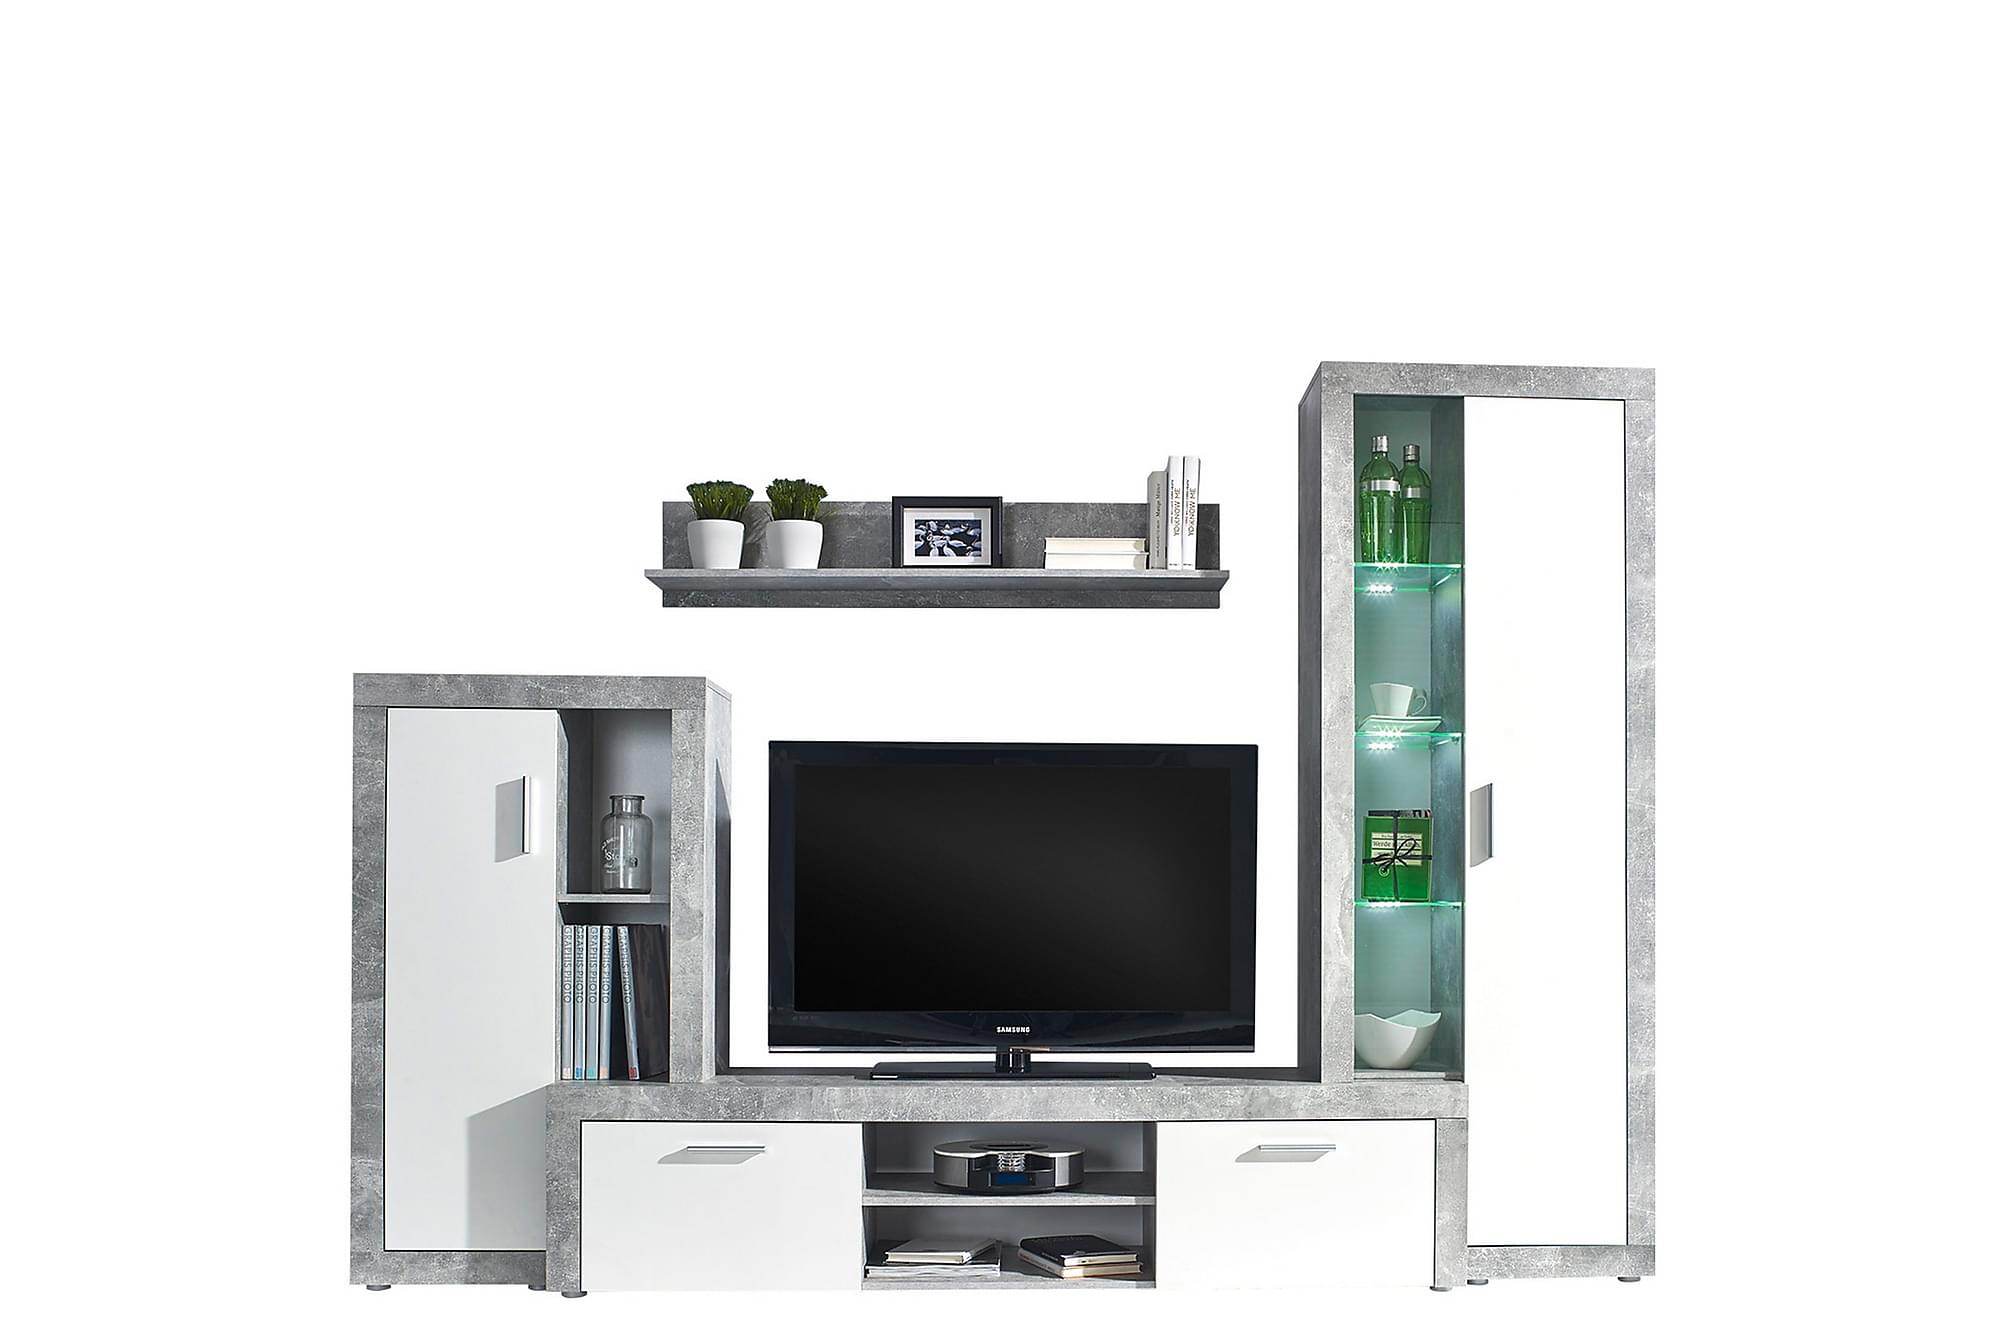 BOLTON Vardagsrumsset Grå/Vit, Möbelset för vardagsrum